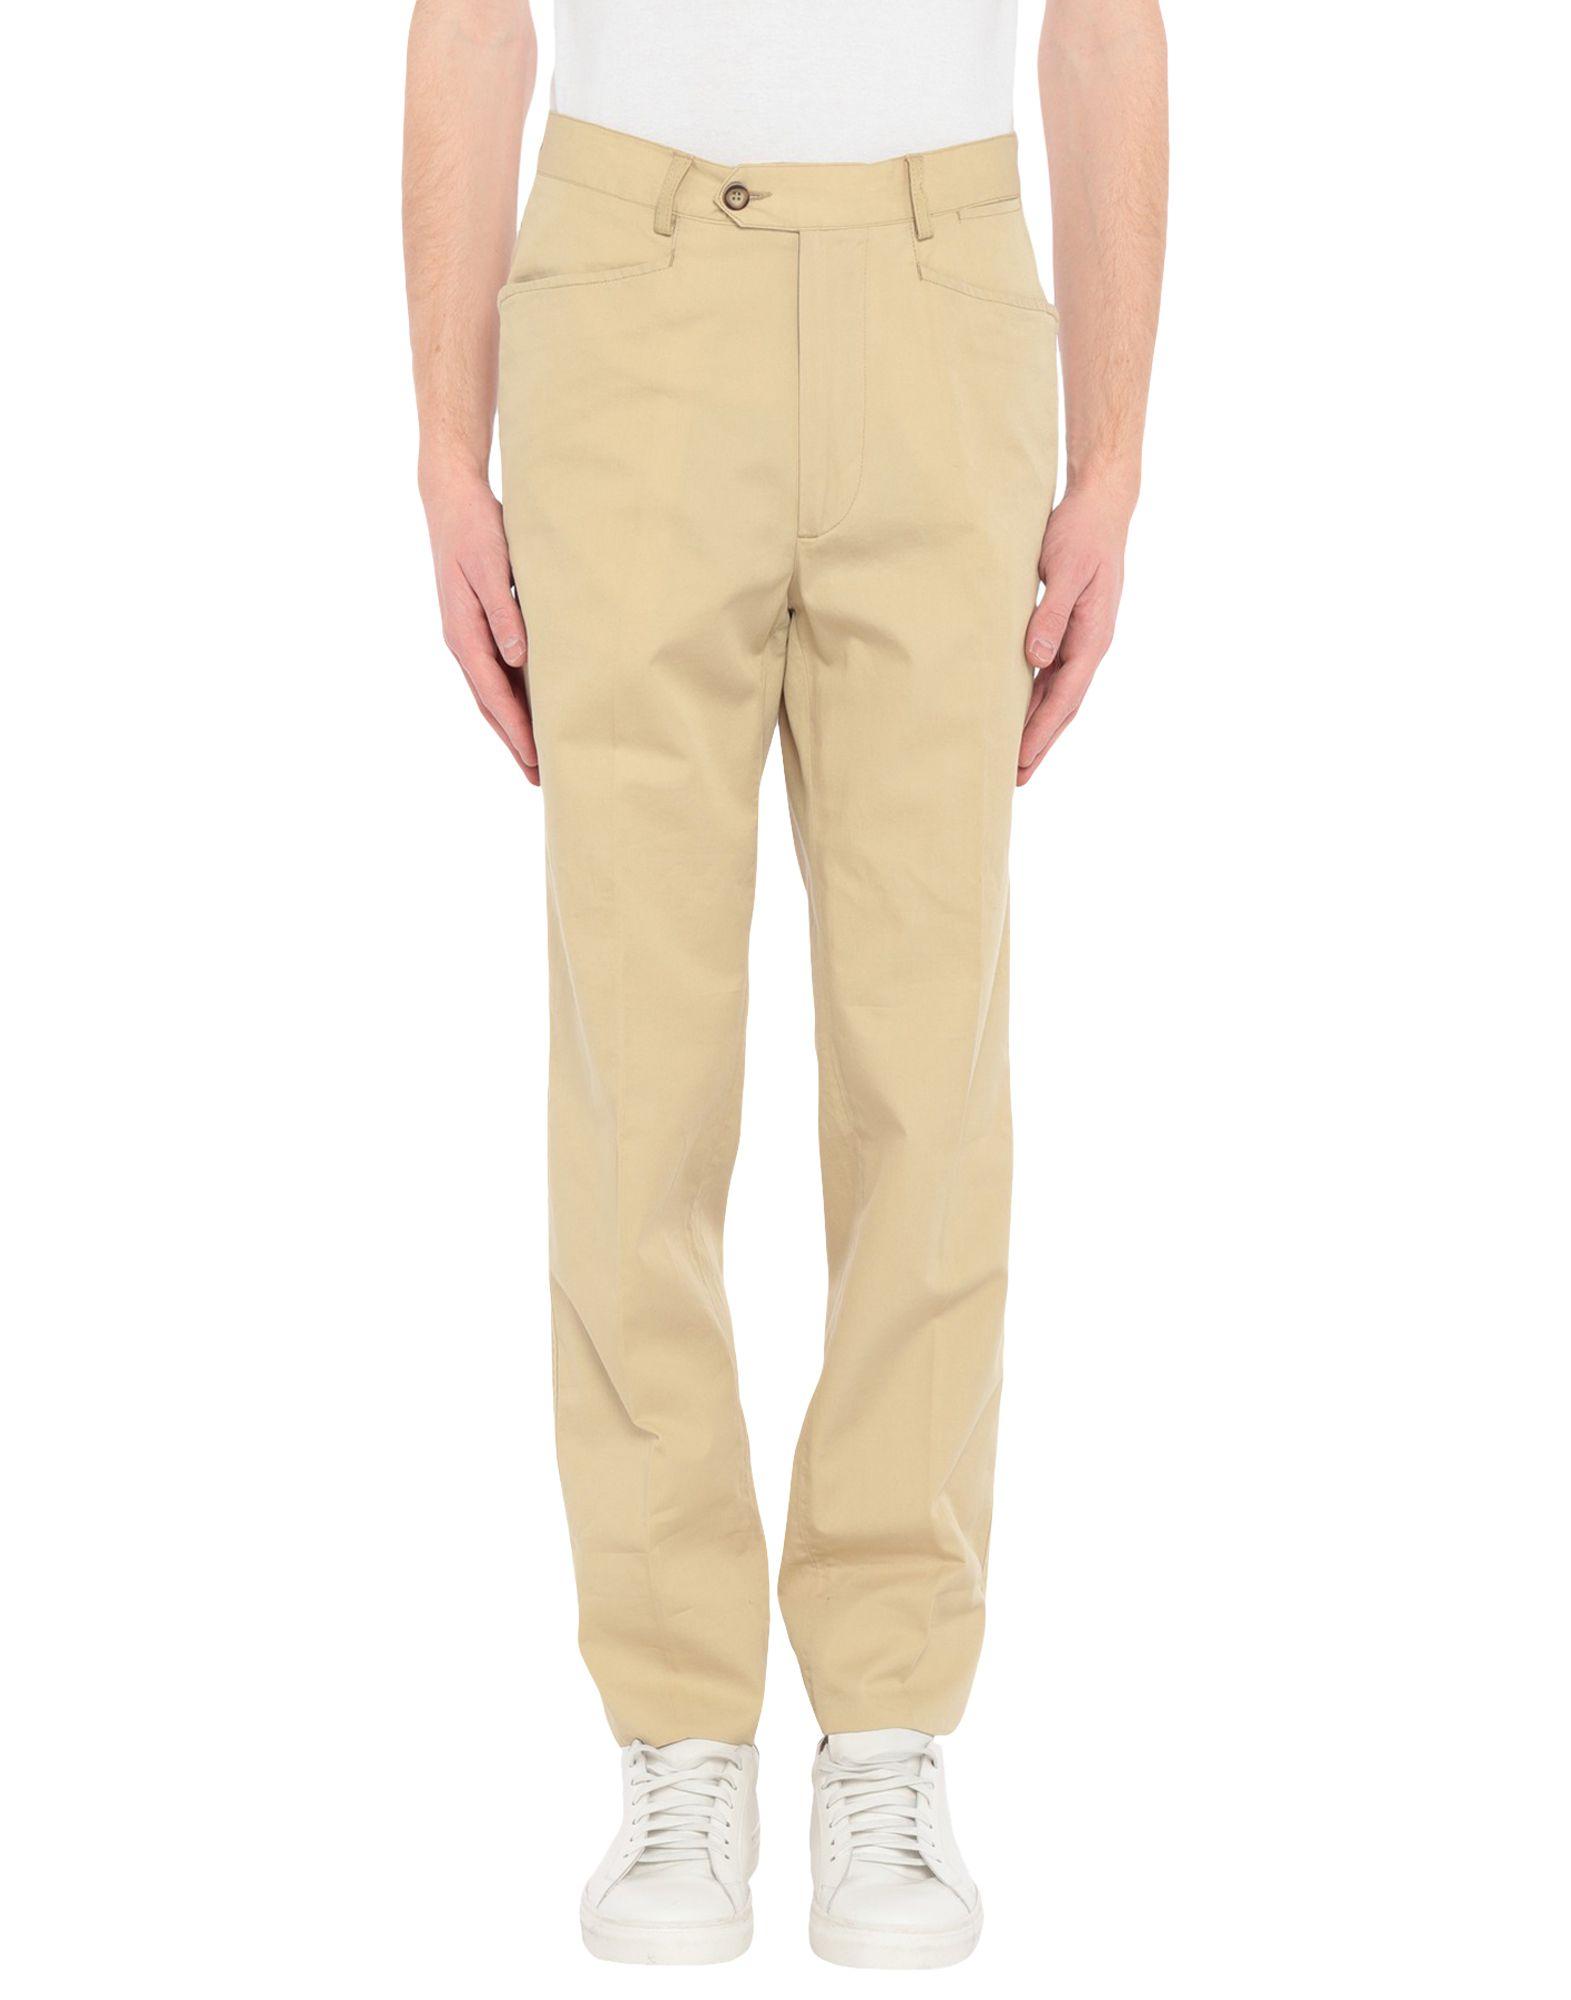 YOOX.COM(ユークス)《セール開催中》JOHN MAC KAY メンズ パンツ ベージュ 44 コットン 100%